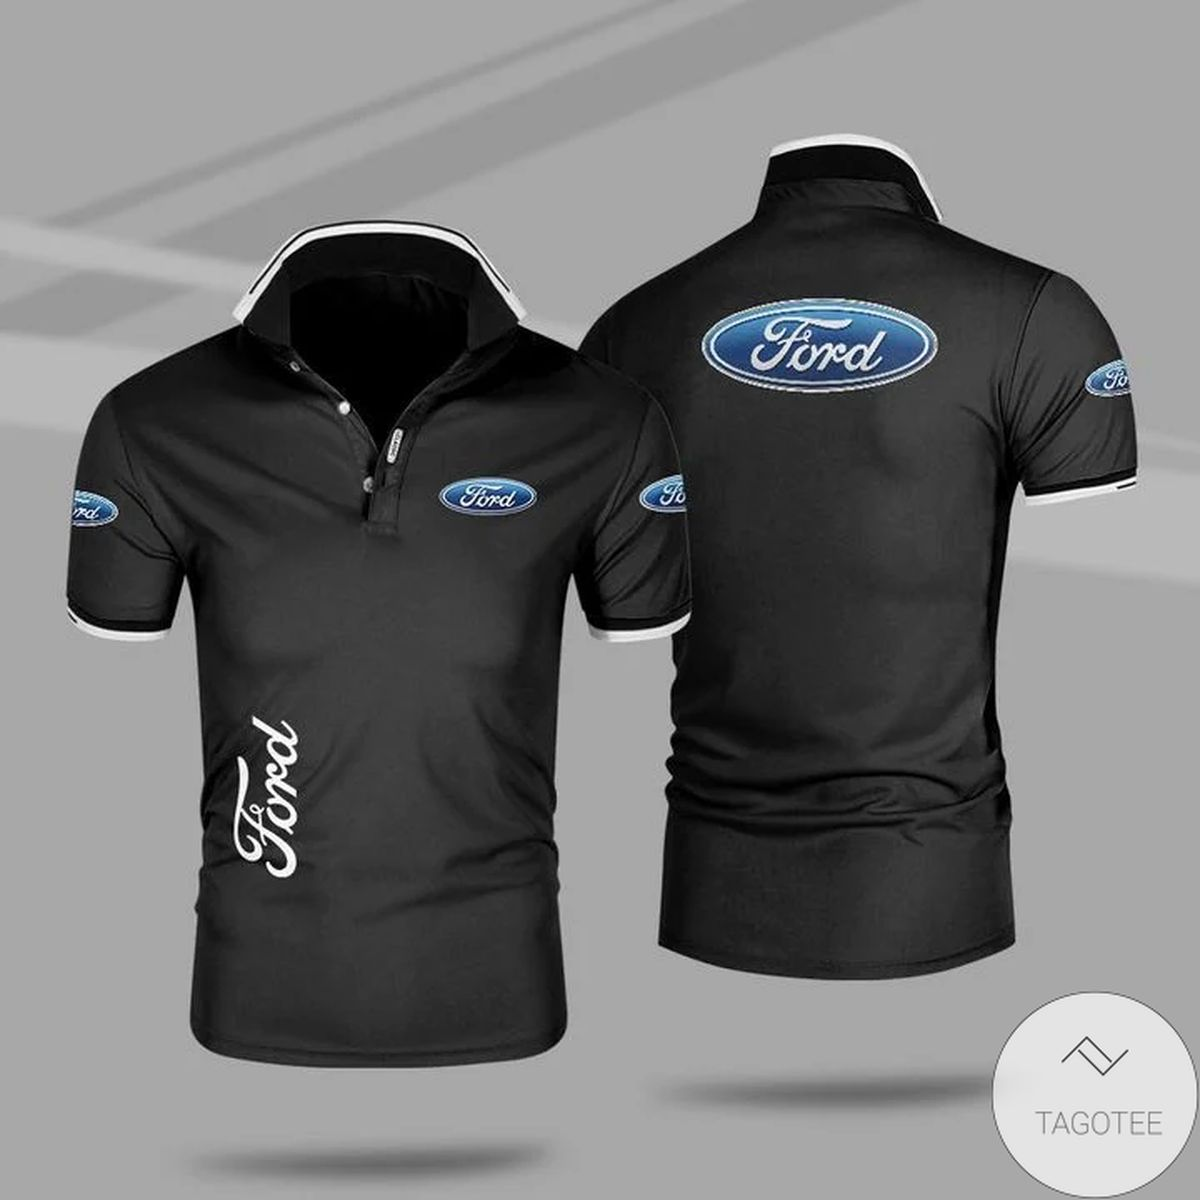 Ford Polo Shirt